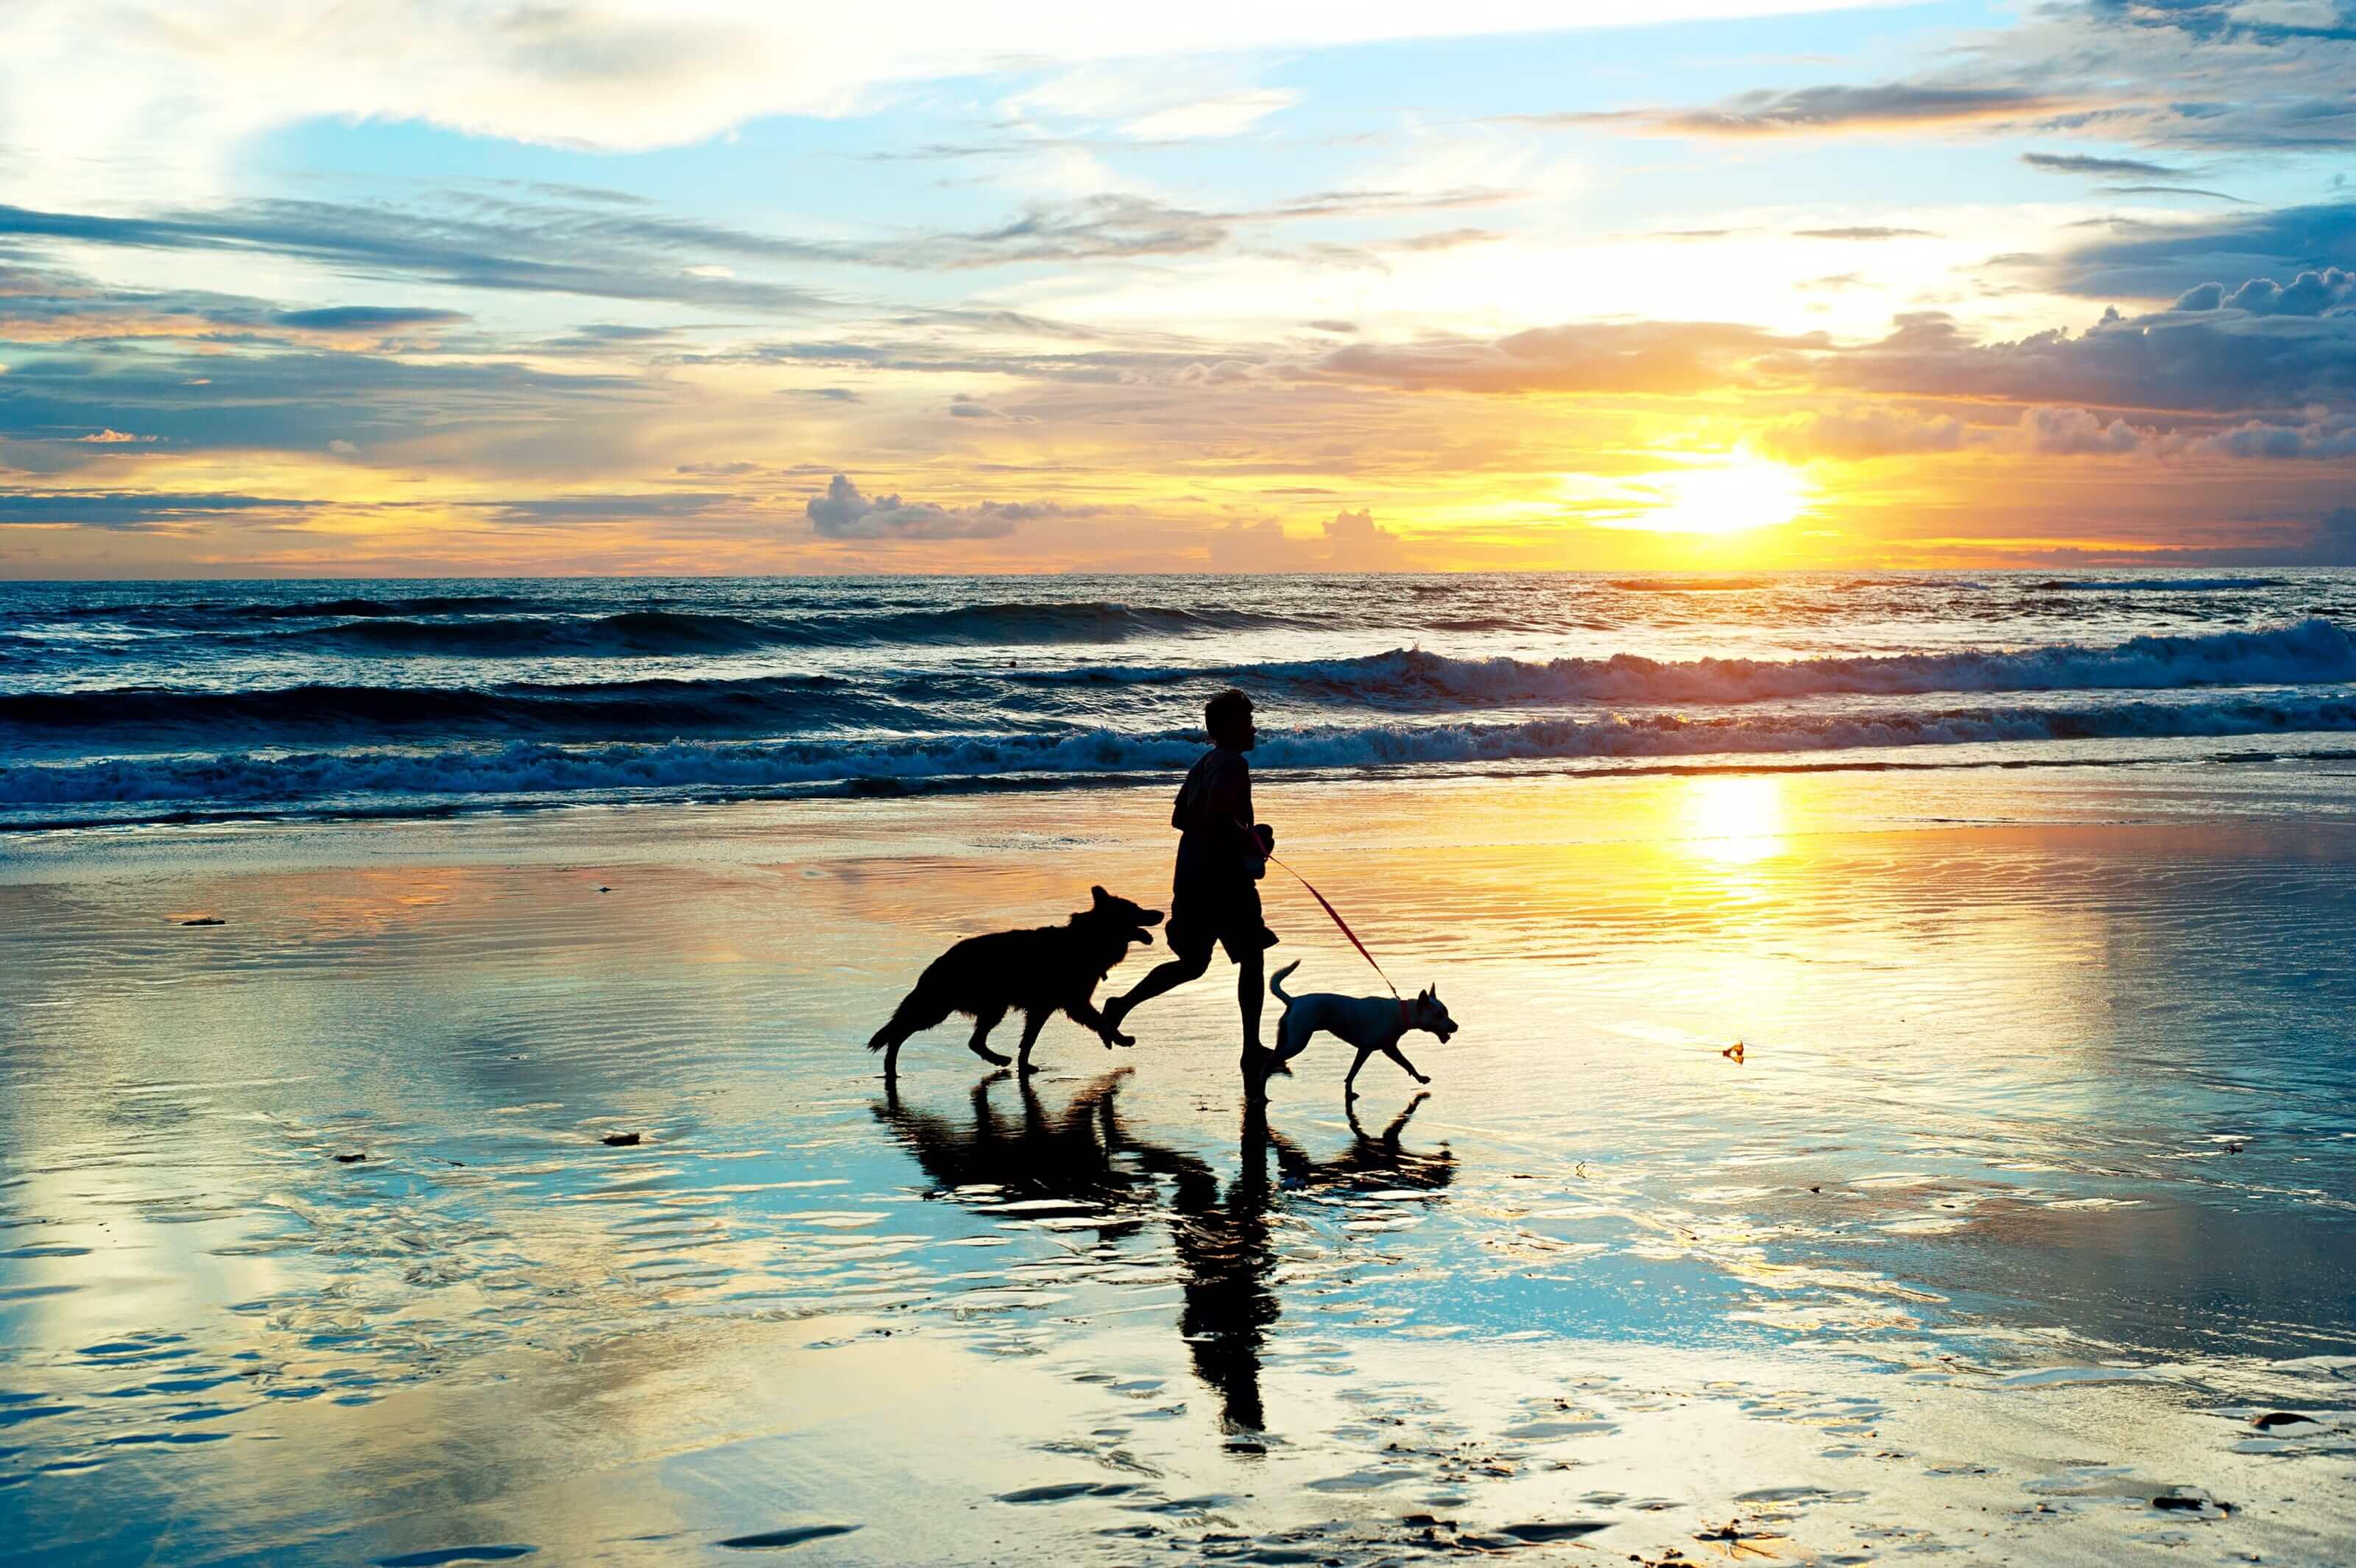 Strandwandeling zonsondergang met honden